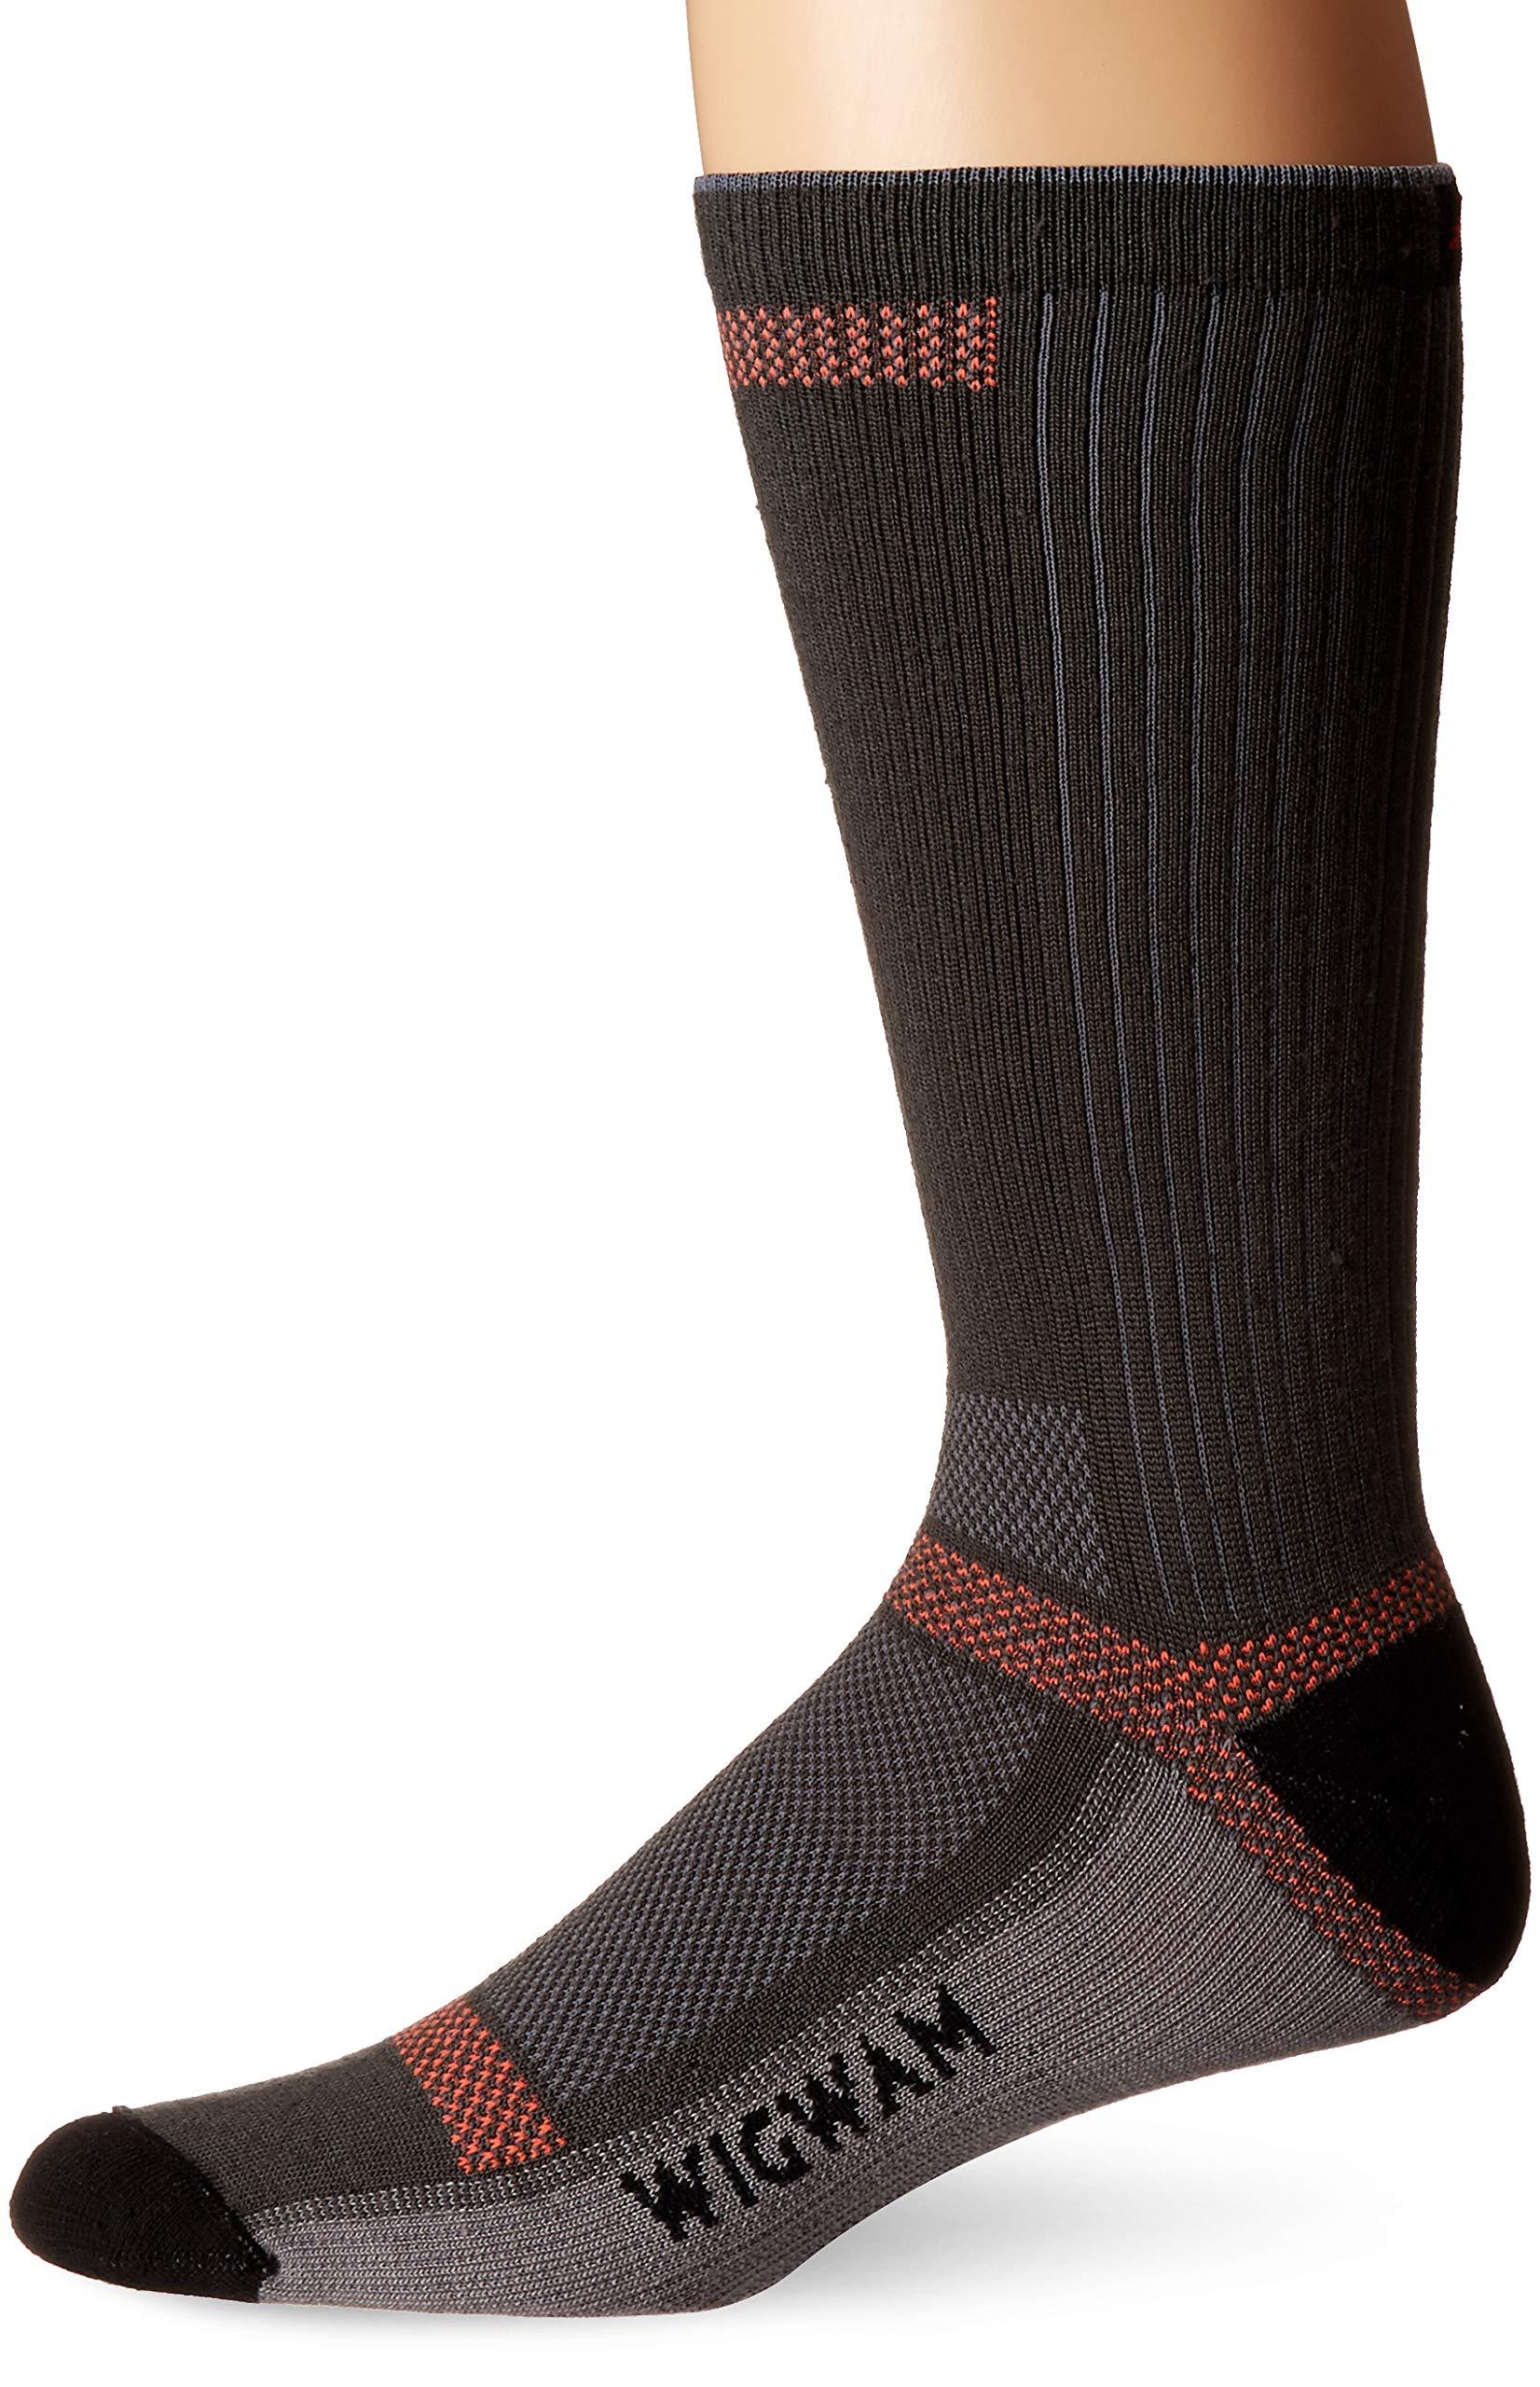 Wigwam Men's Cool-Lite Ultimax Ultra-Lightweight Crew Sock